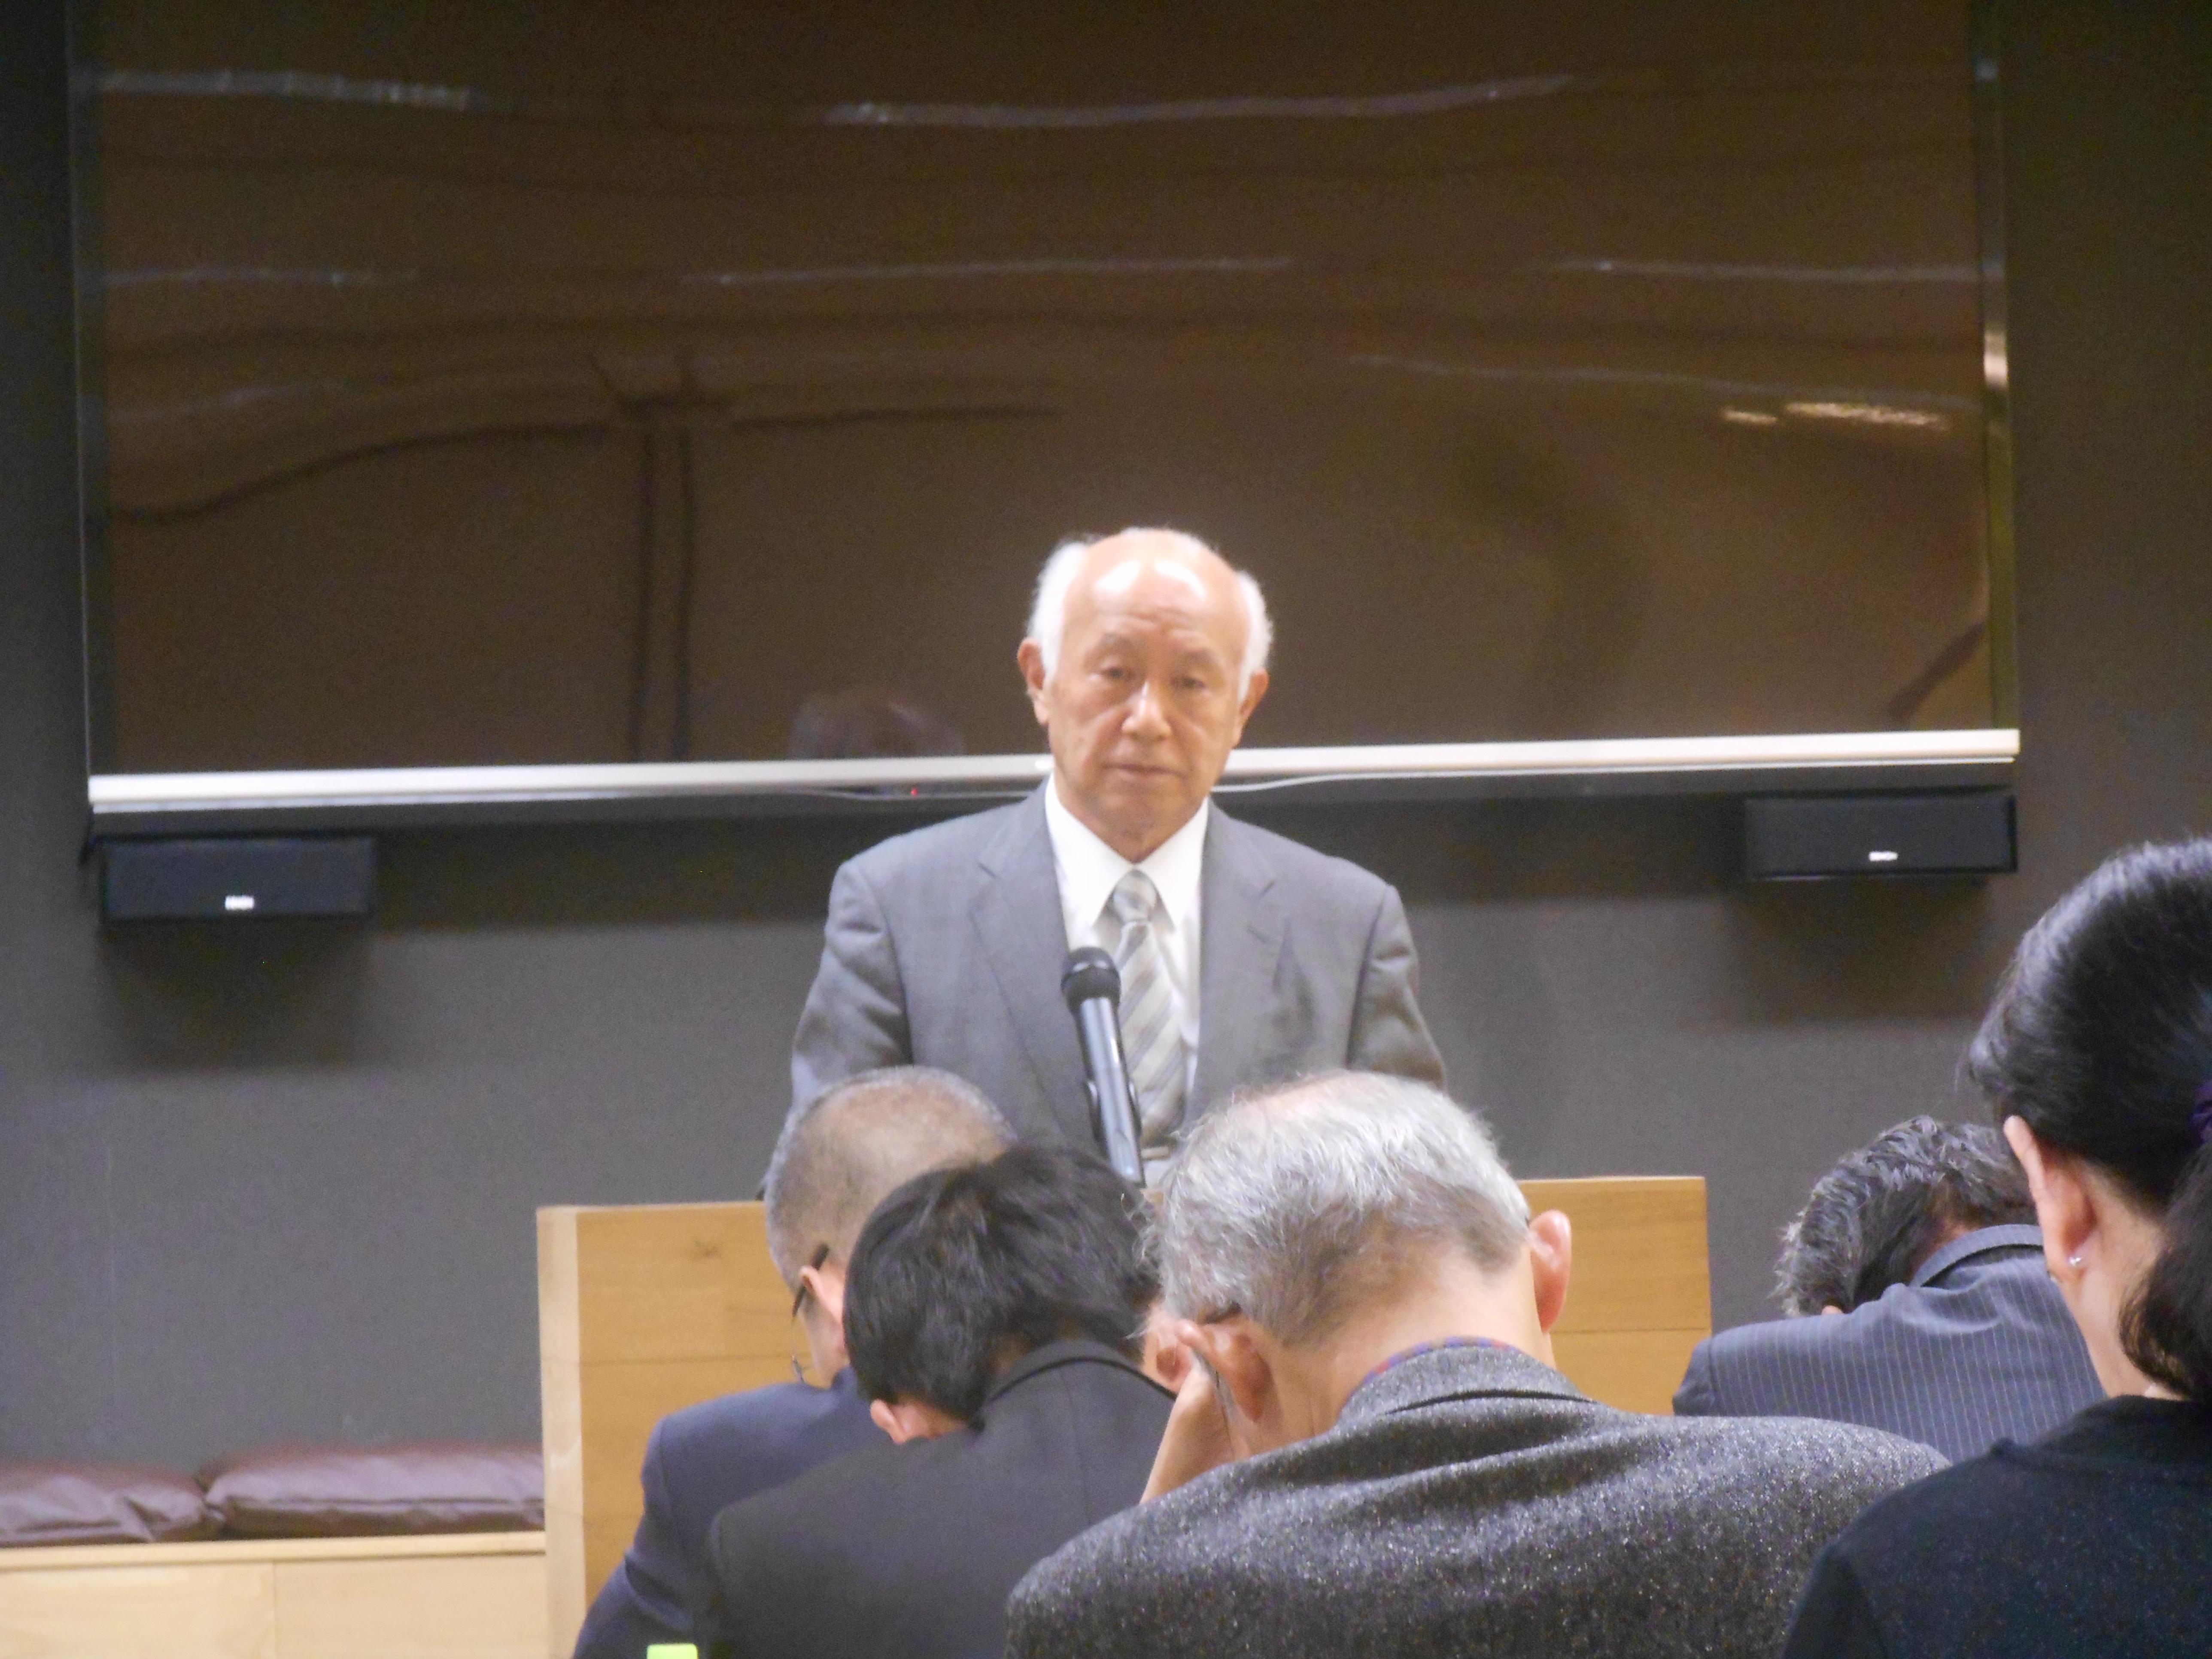 DSCN2302 - 4月1日東京思風塾の開催になります。